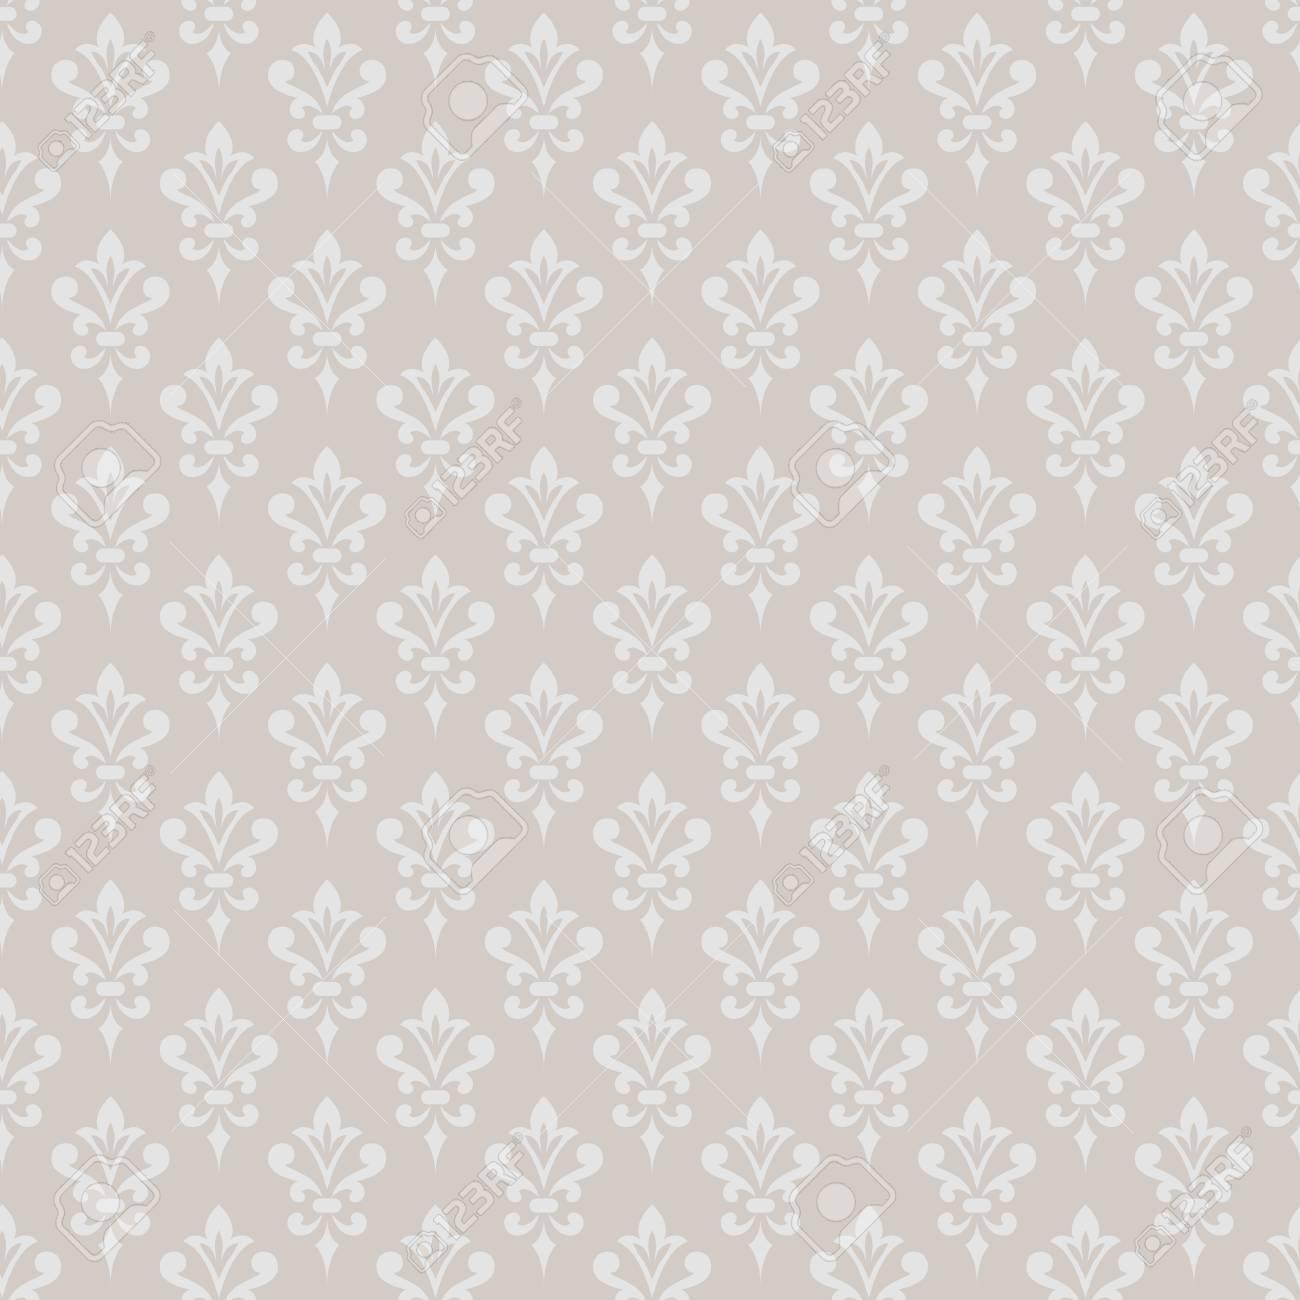 58014089 damask wallpaper elegant background in victorian style elegant vintage ornament in monochrome colors